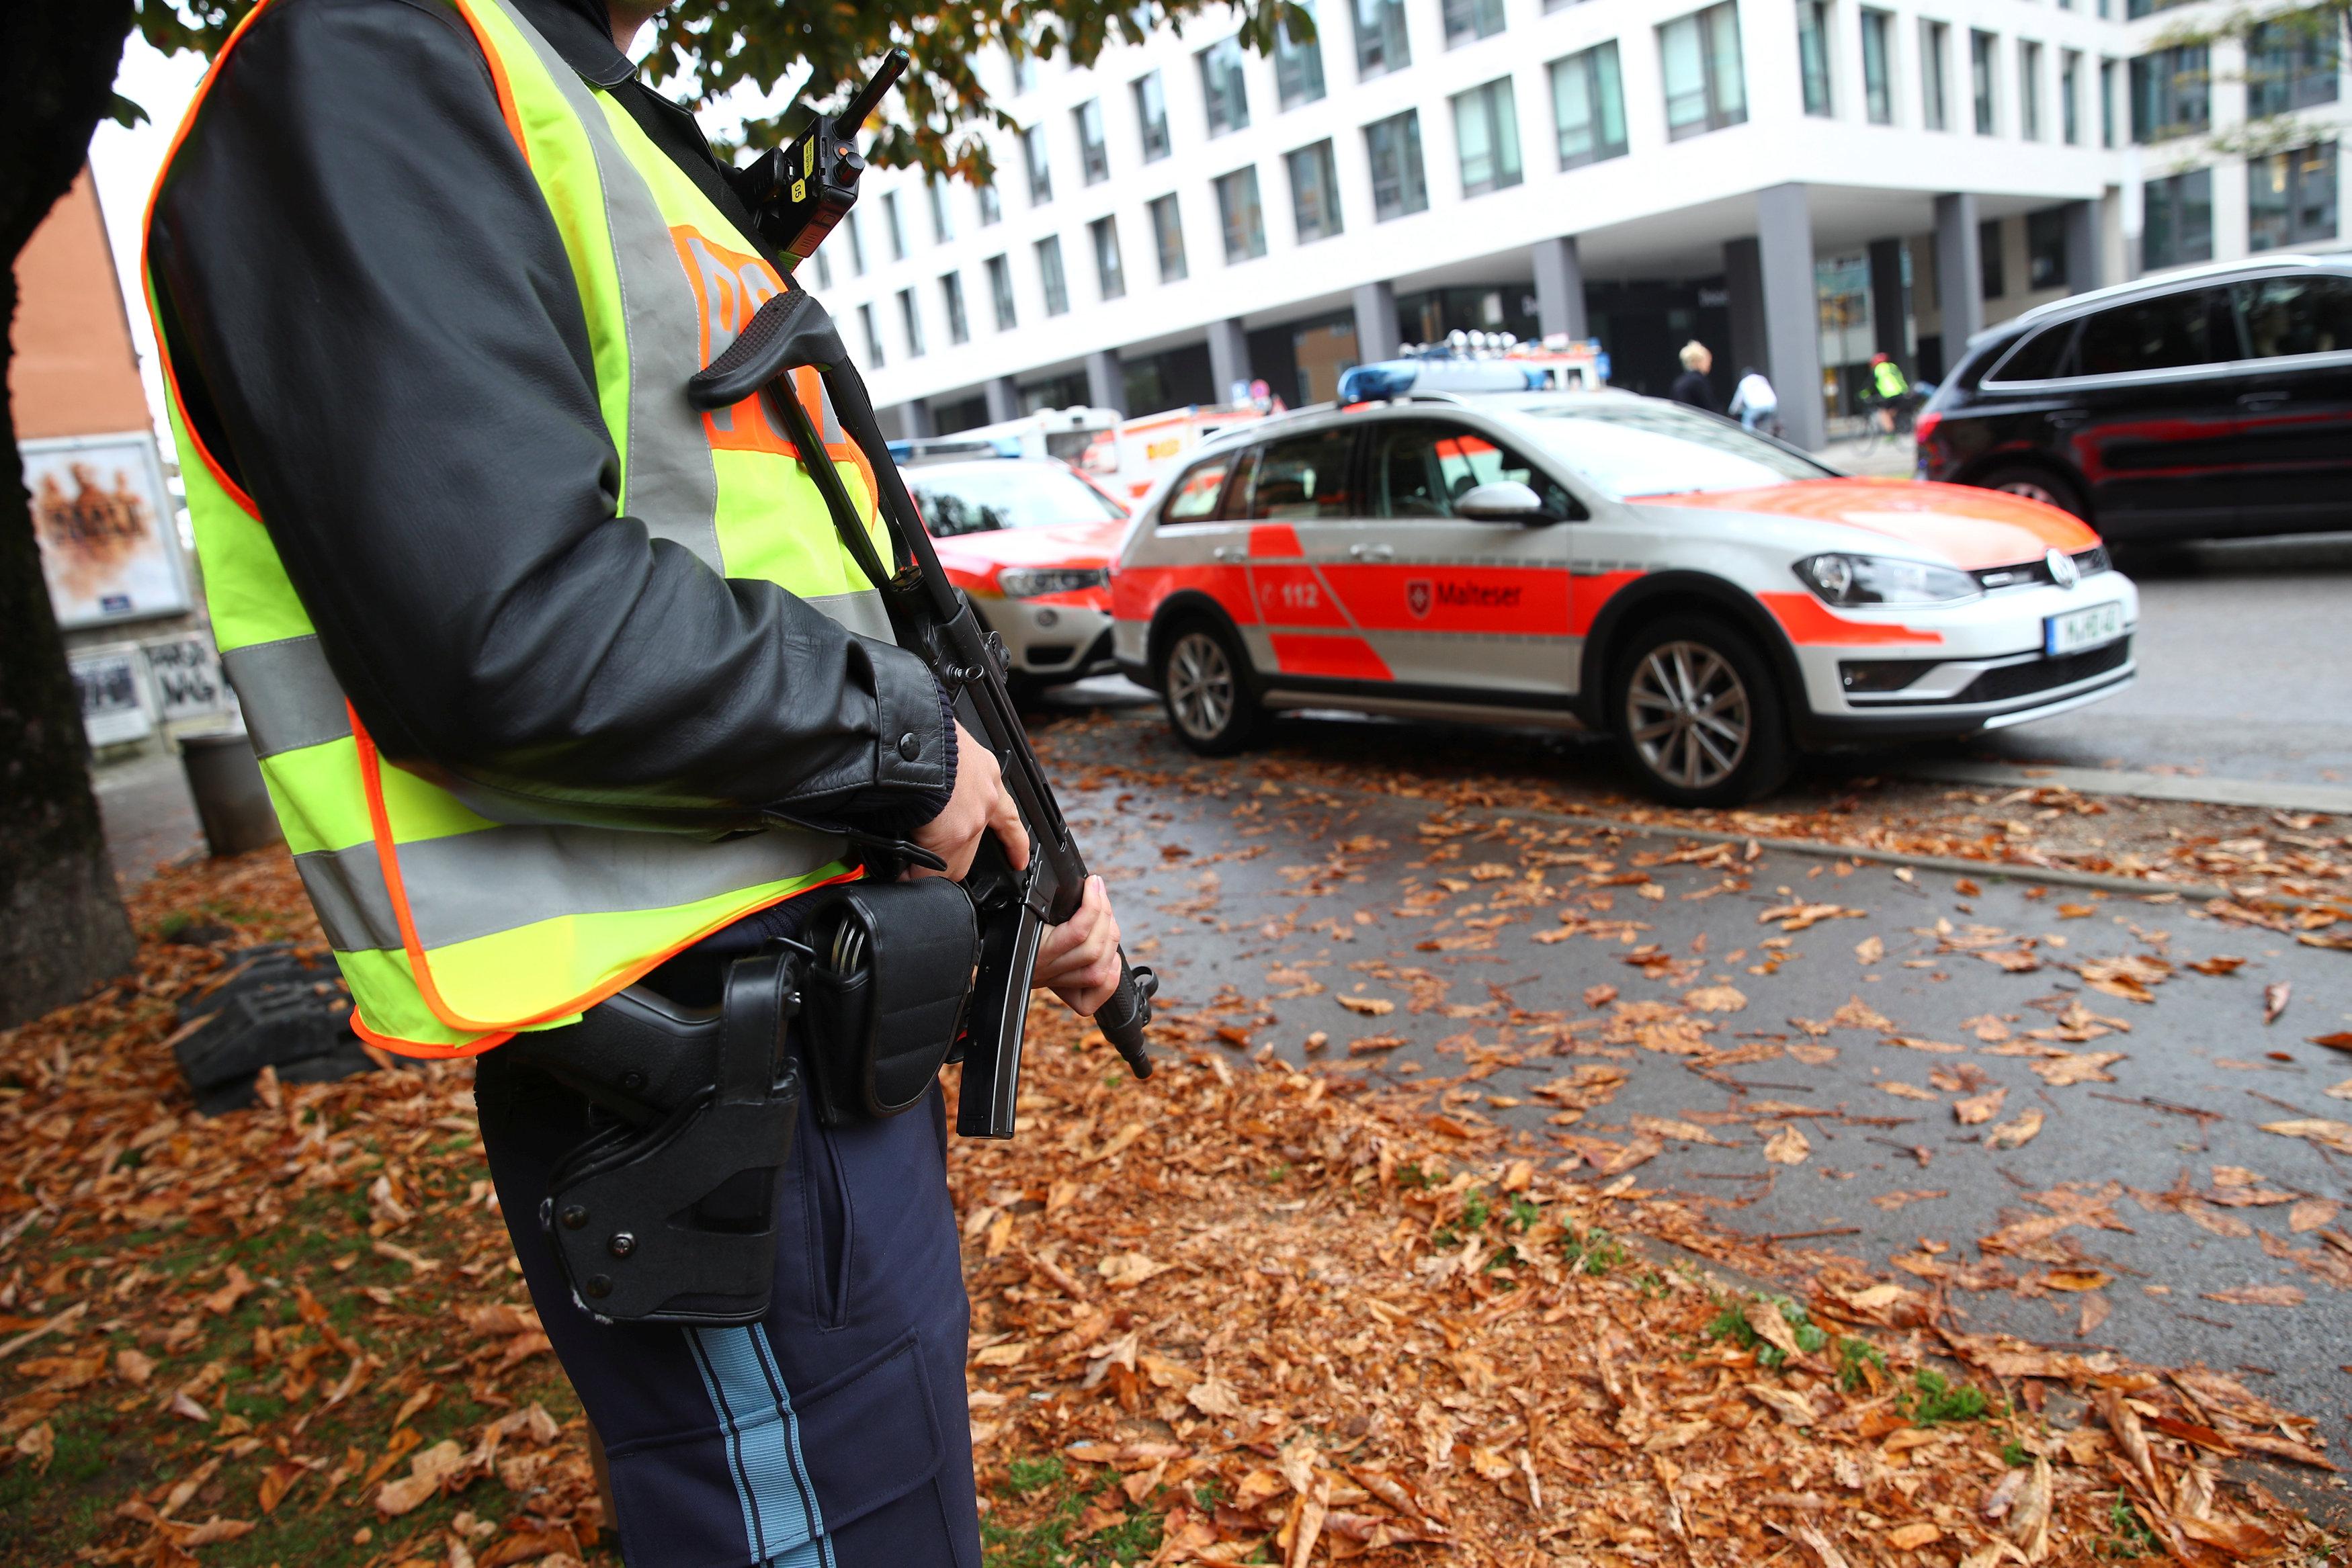 German police detain suspect in Munich knife attack